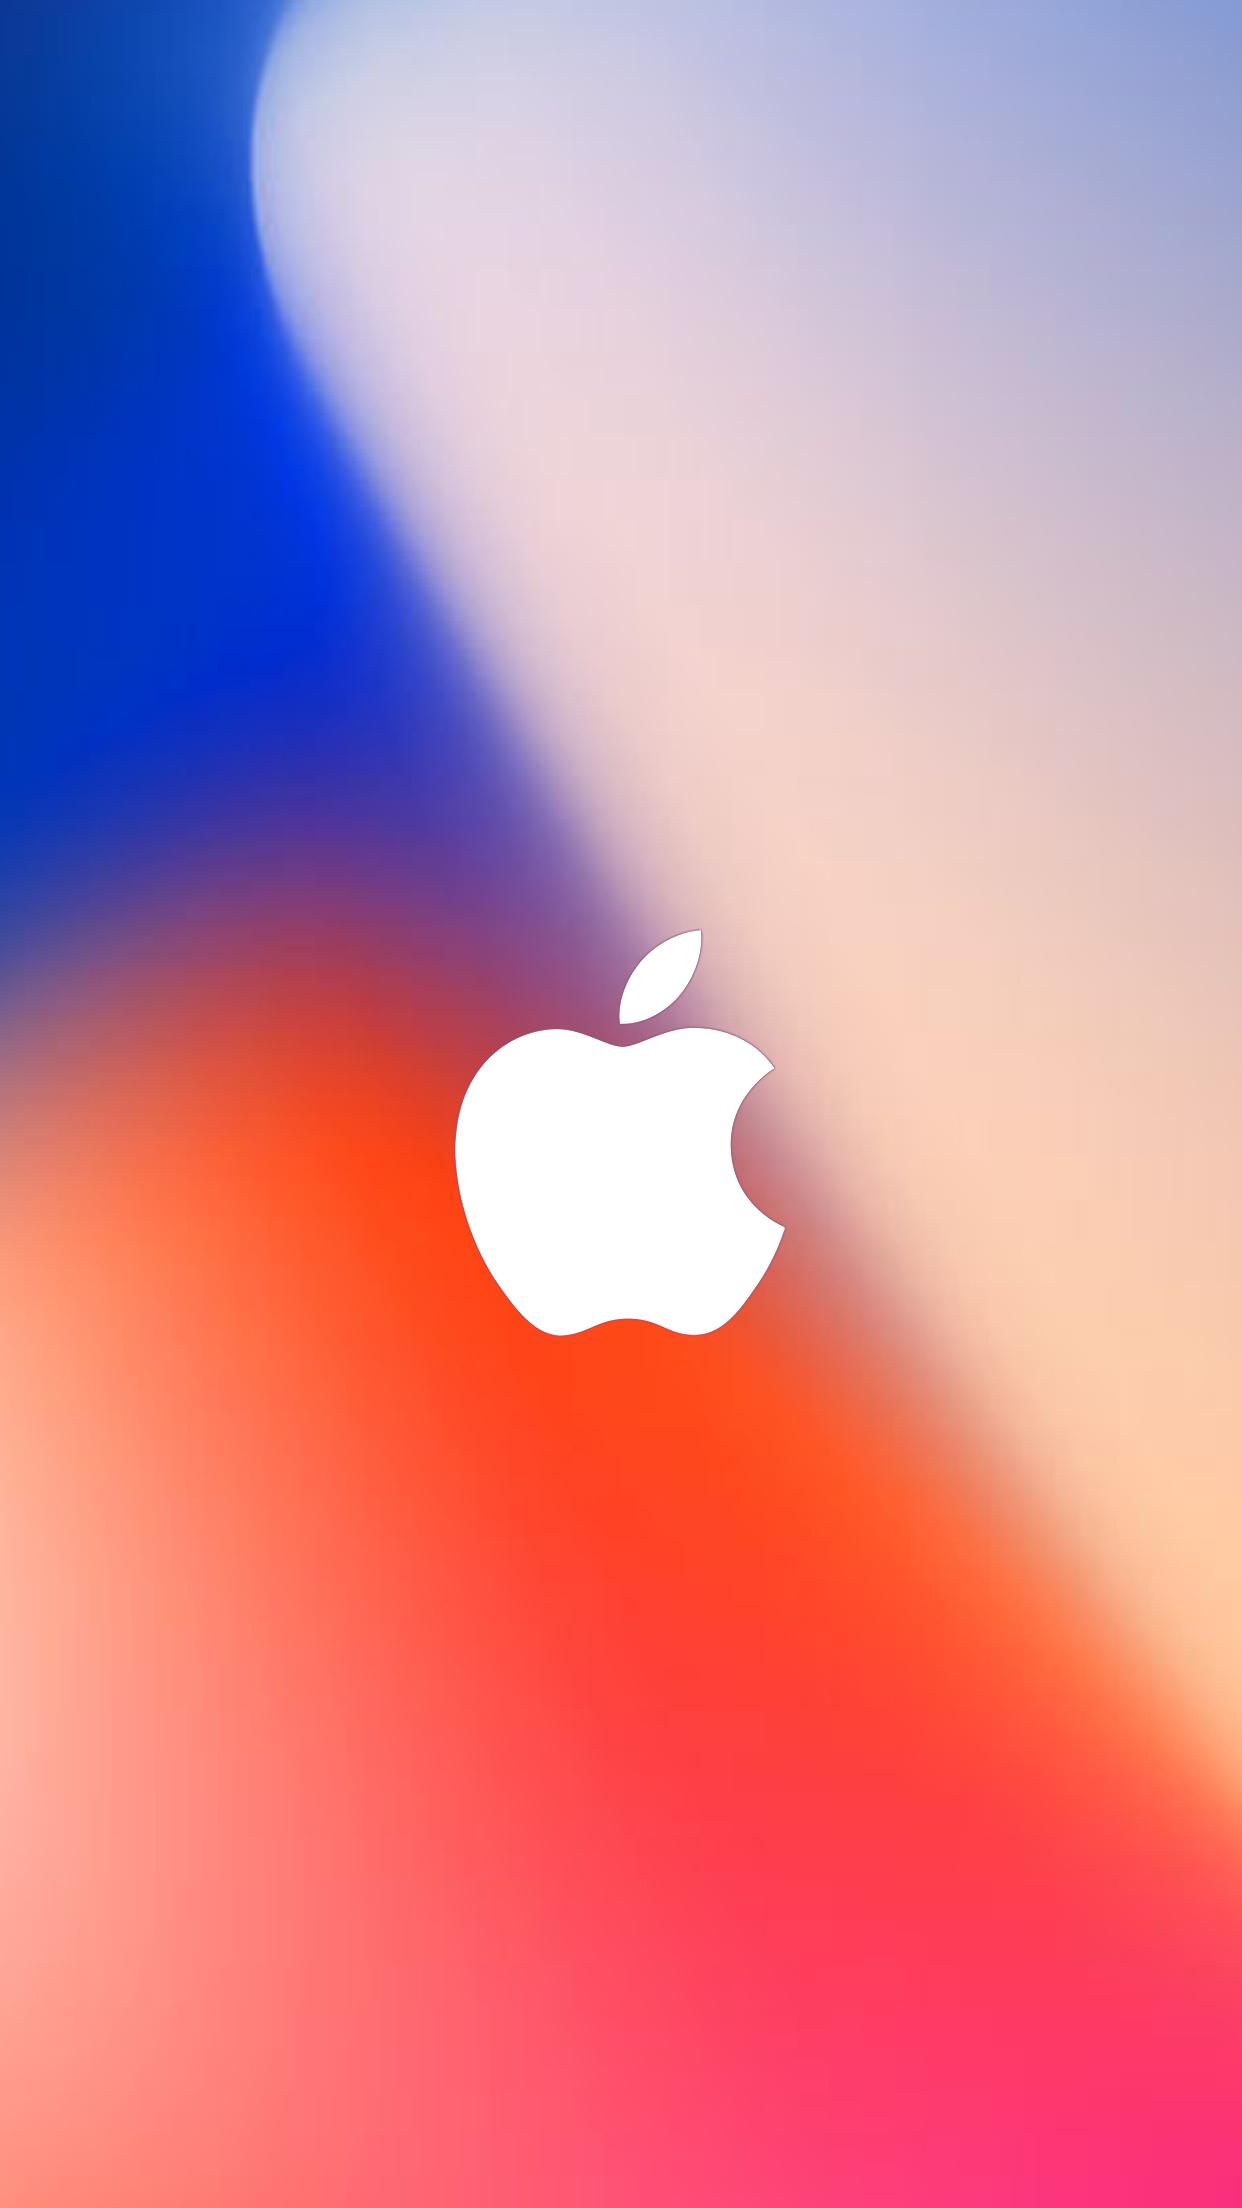 Apple Wallpaper Iphone 8 Plus